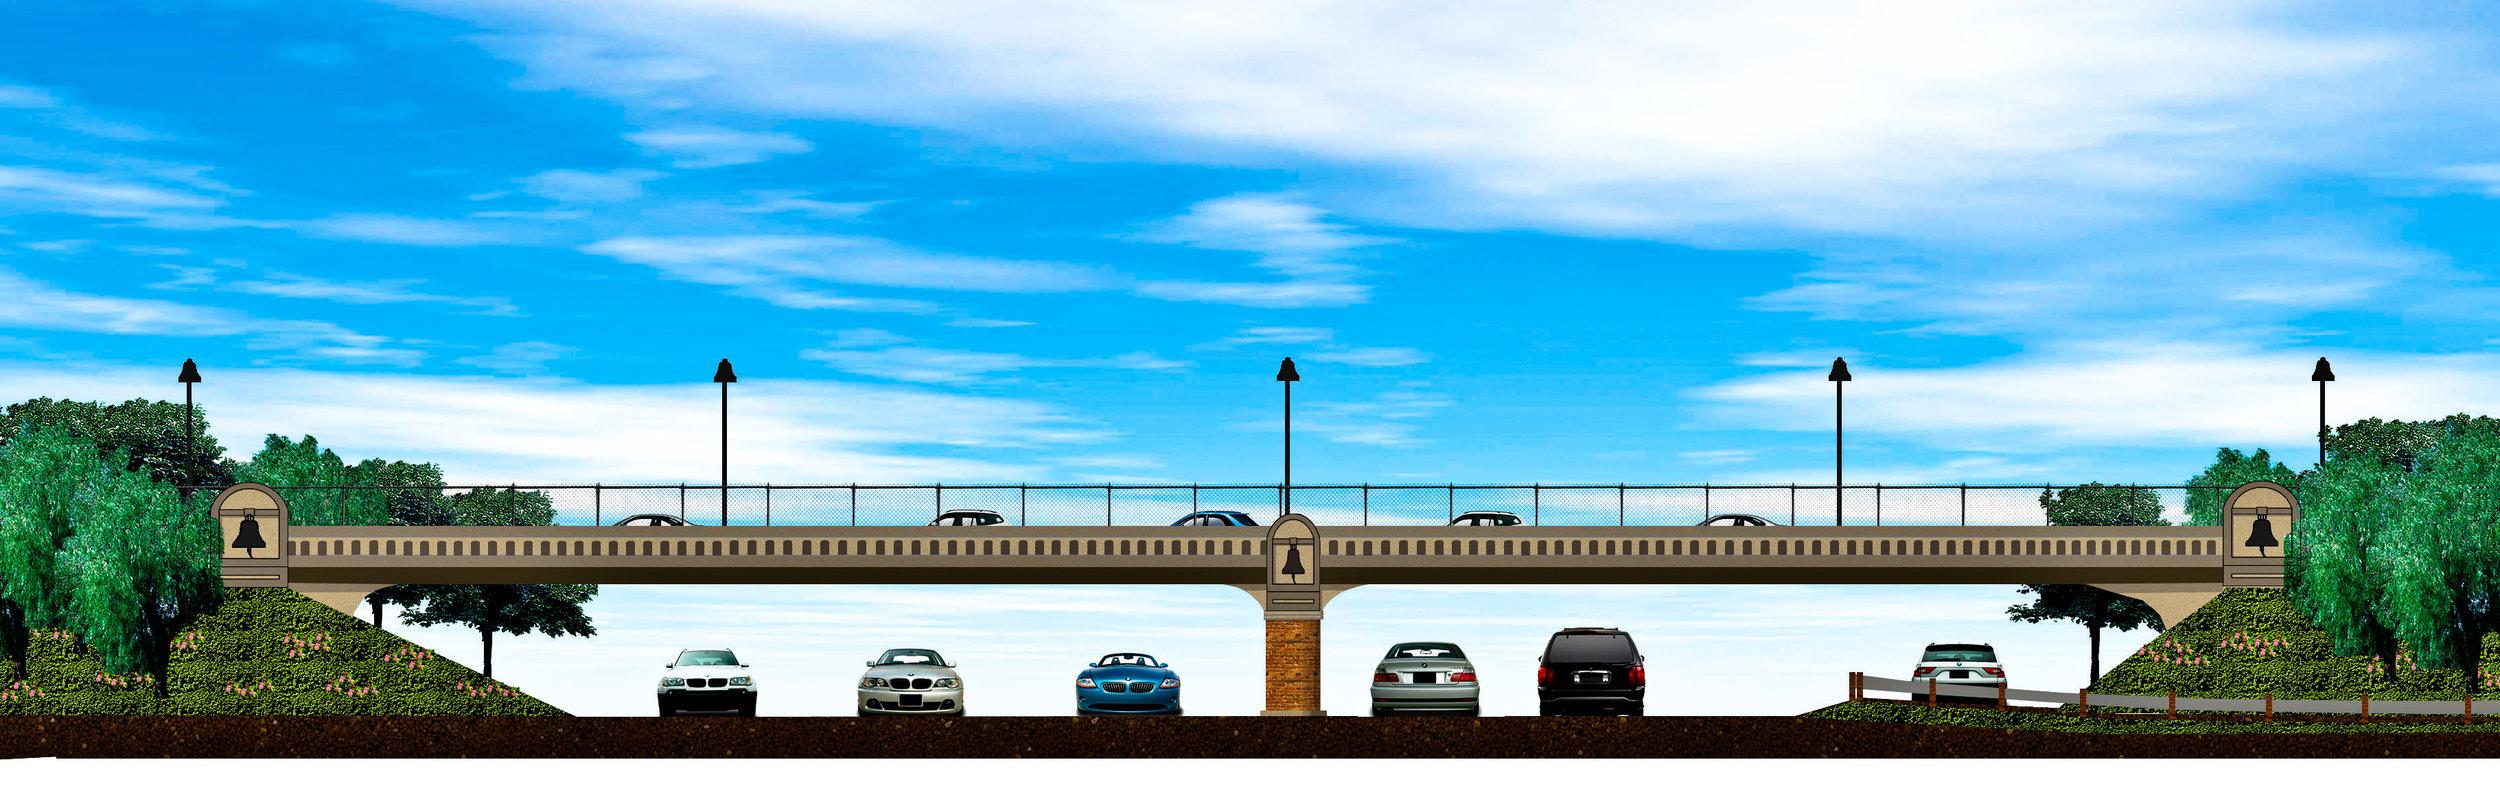 I-5 and Ortega Bridge - Elevation B concept (01-16-2008).jpg